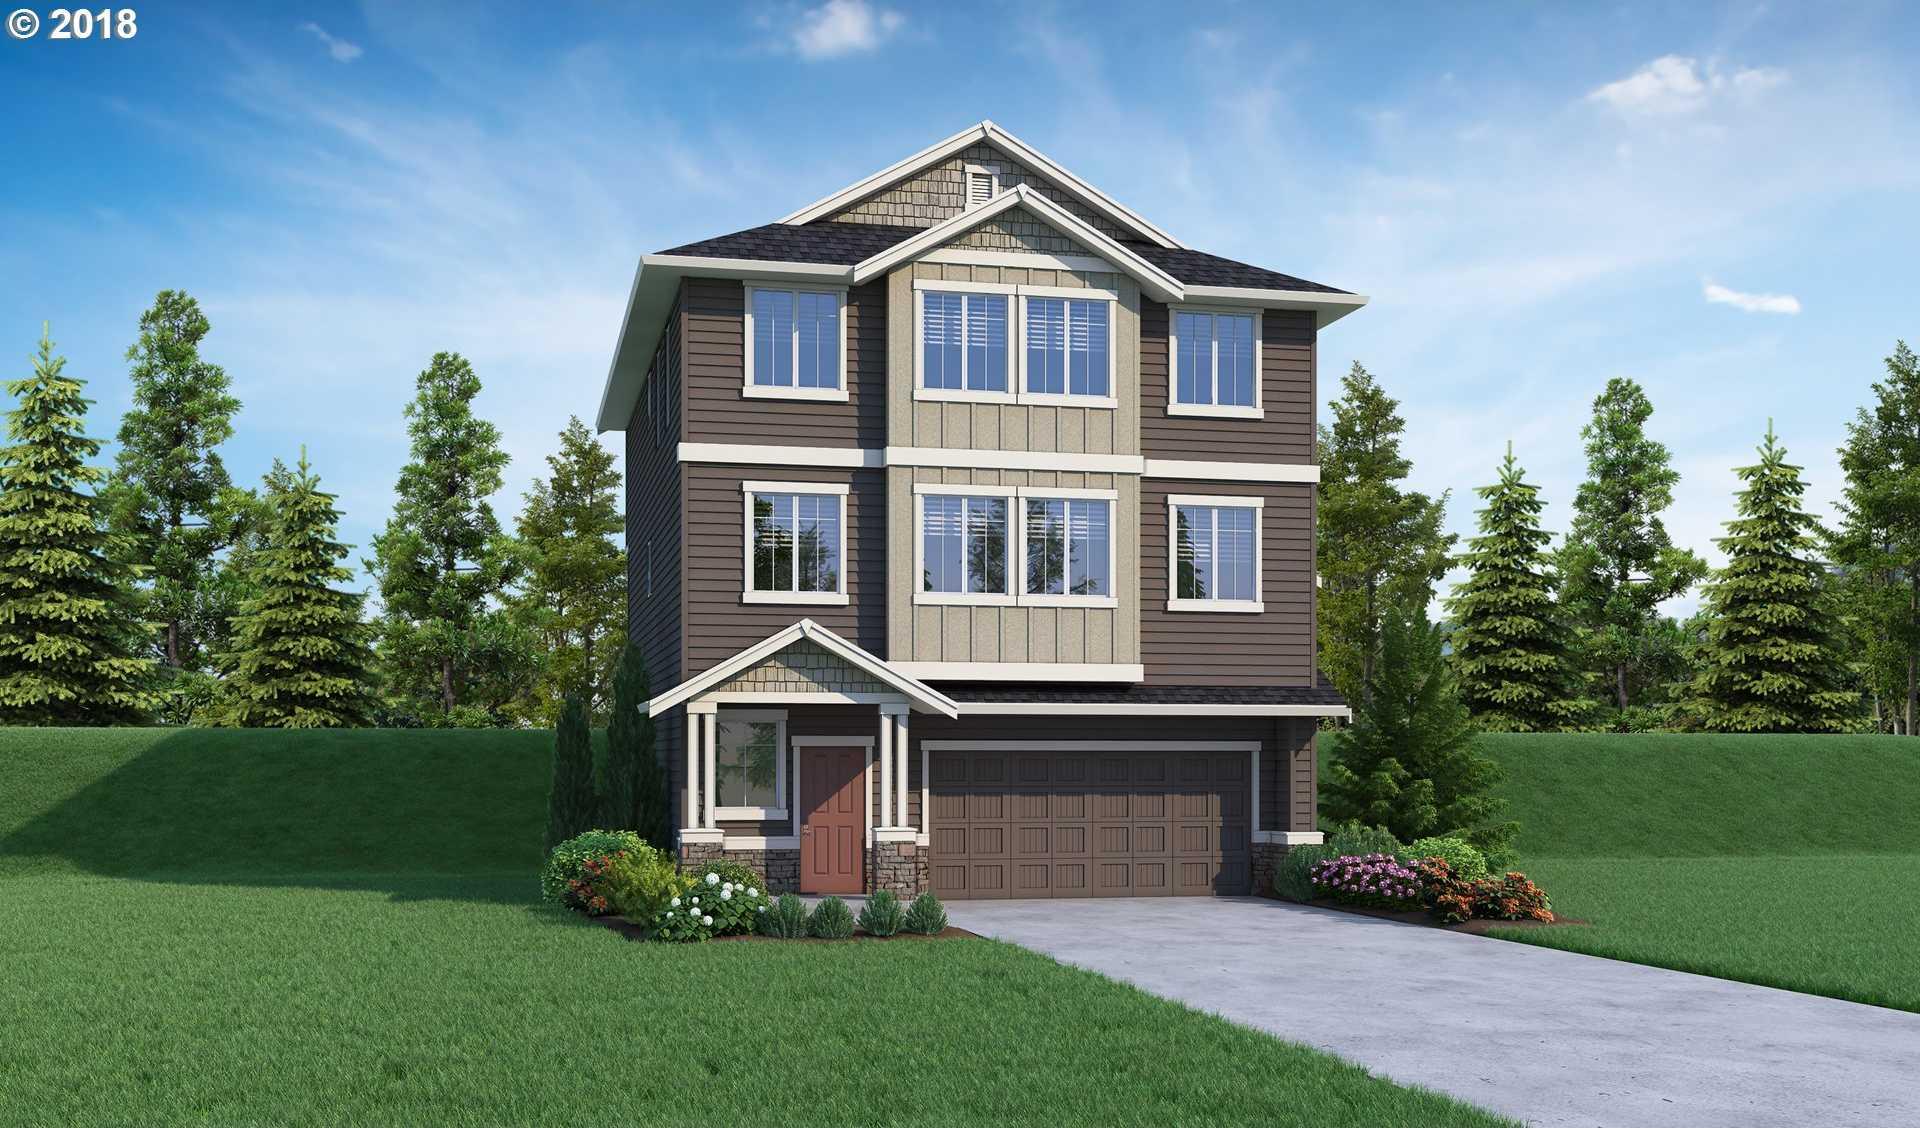 $549,995 - 4Br/3Ba -  for Sale in Beaverton